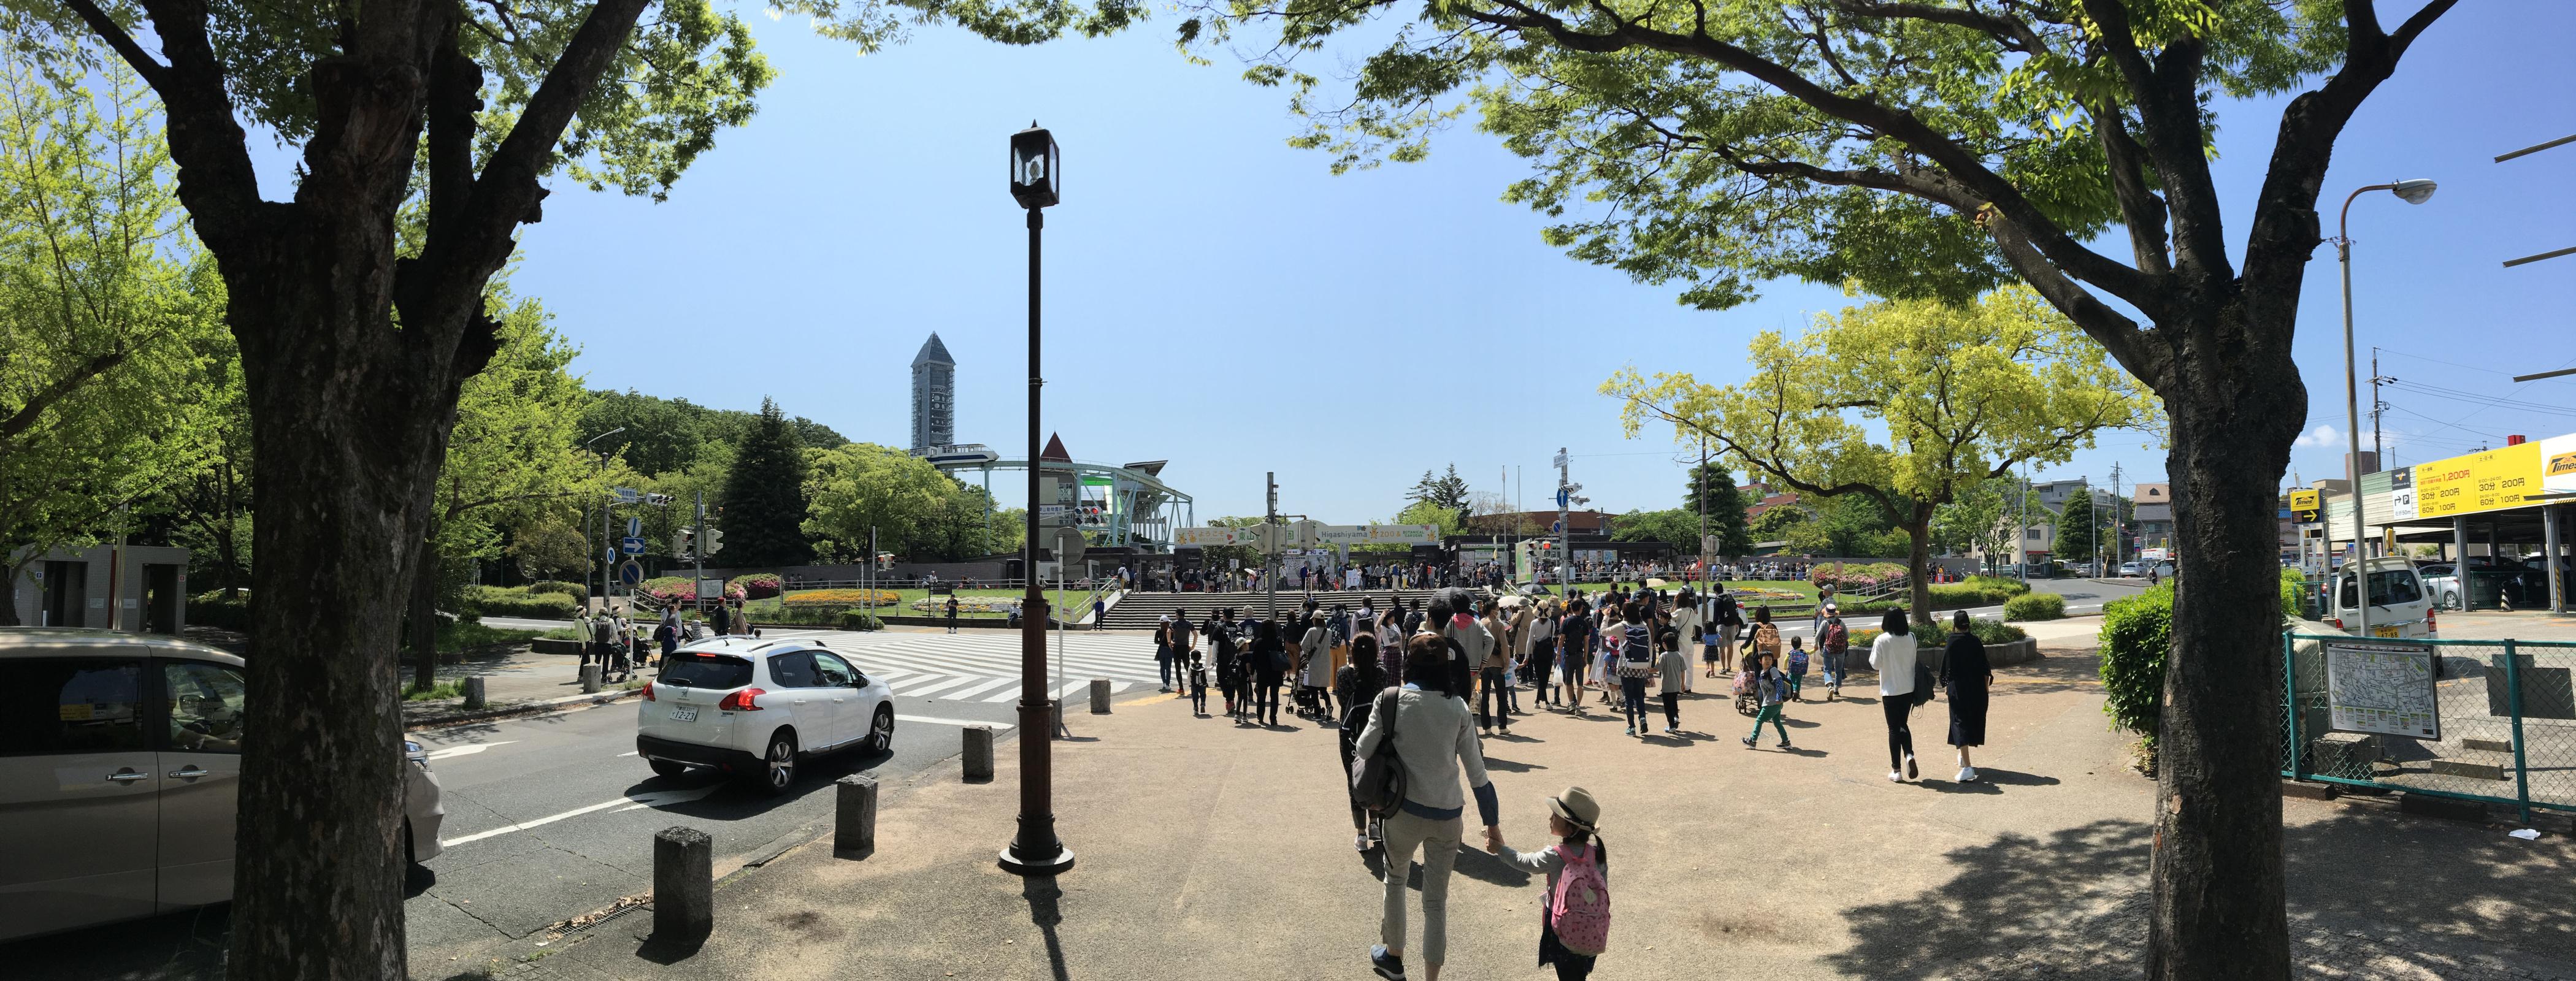 Nagoya's Higashiyama Zoo - East Gate